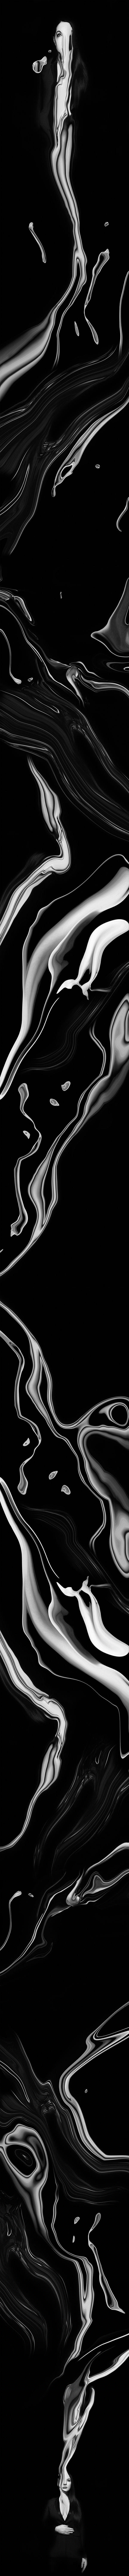 "DUSAN RELJIN x ANTI: ""MELTING POT"" on Behance"